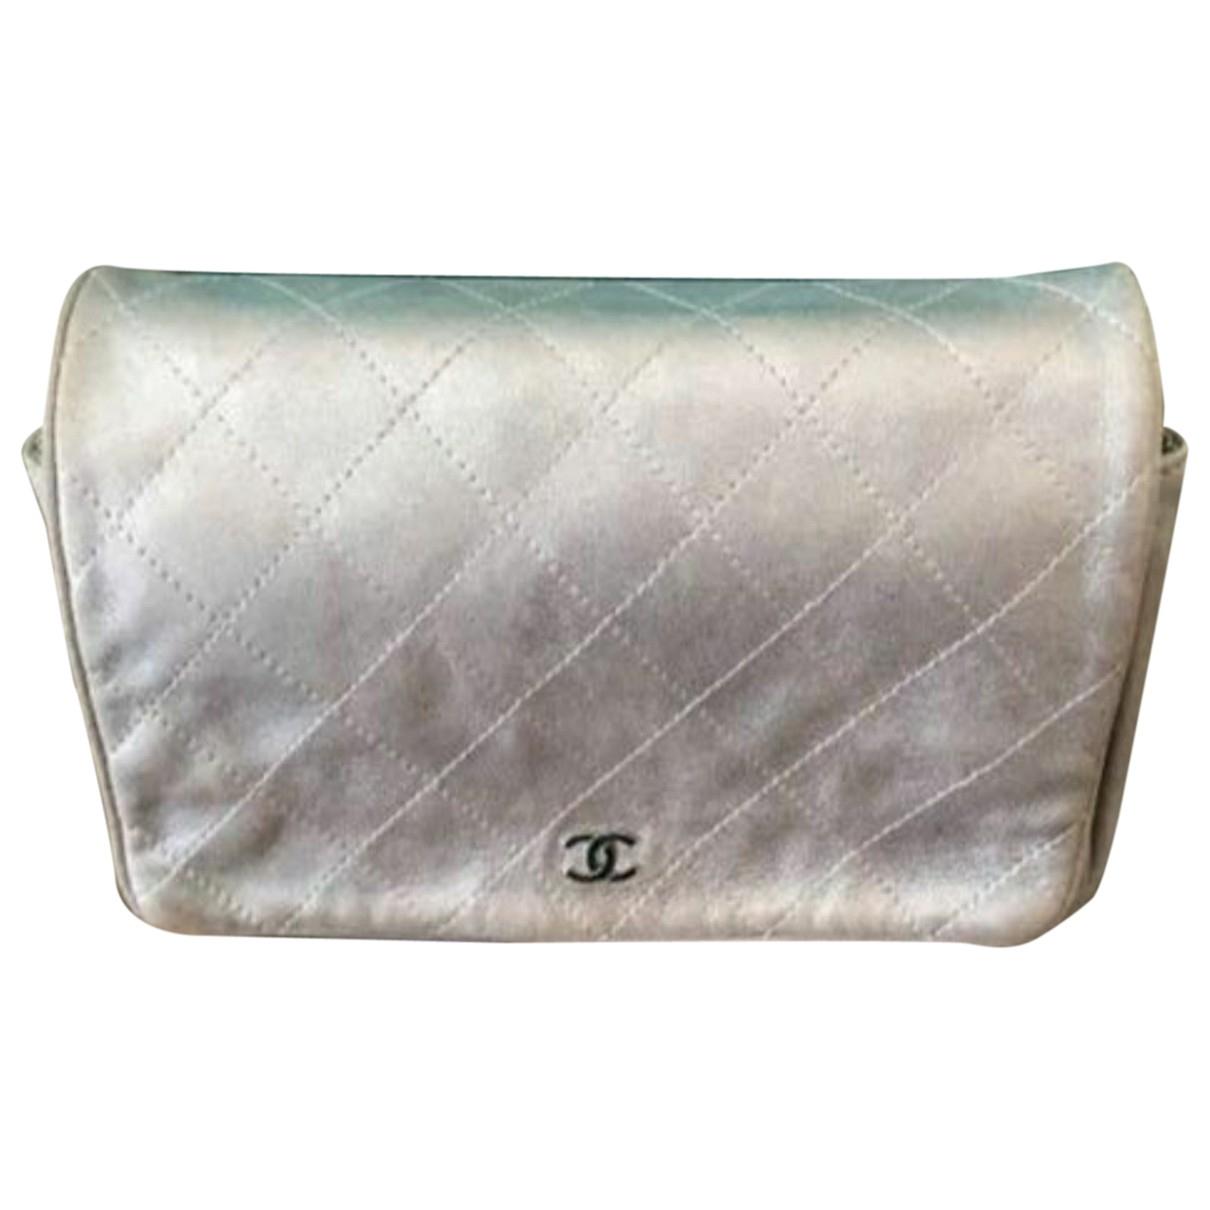 Chanel Wallet on Chain Handtasche in  Metallic Leder